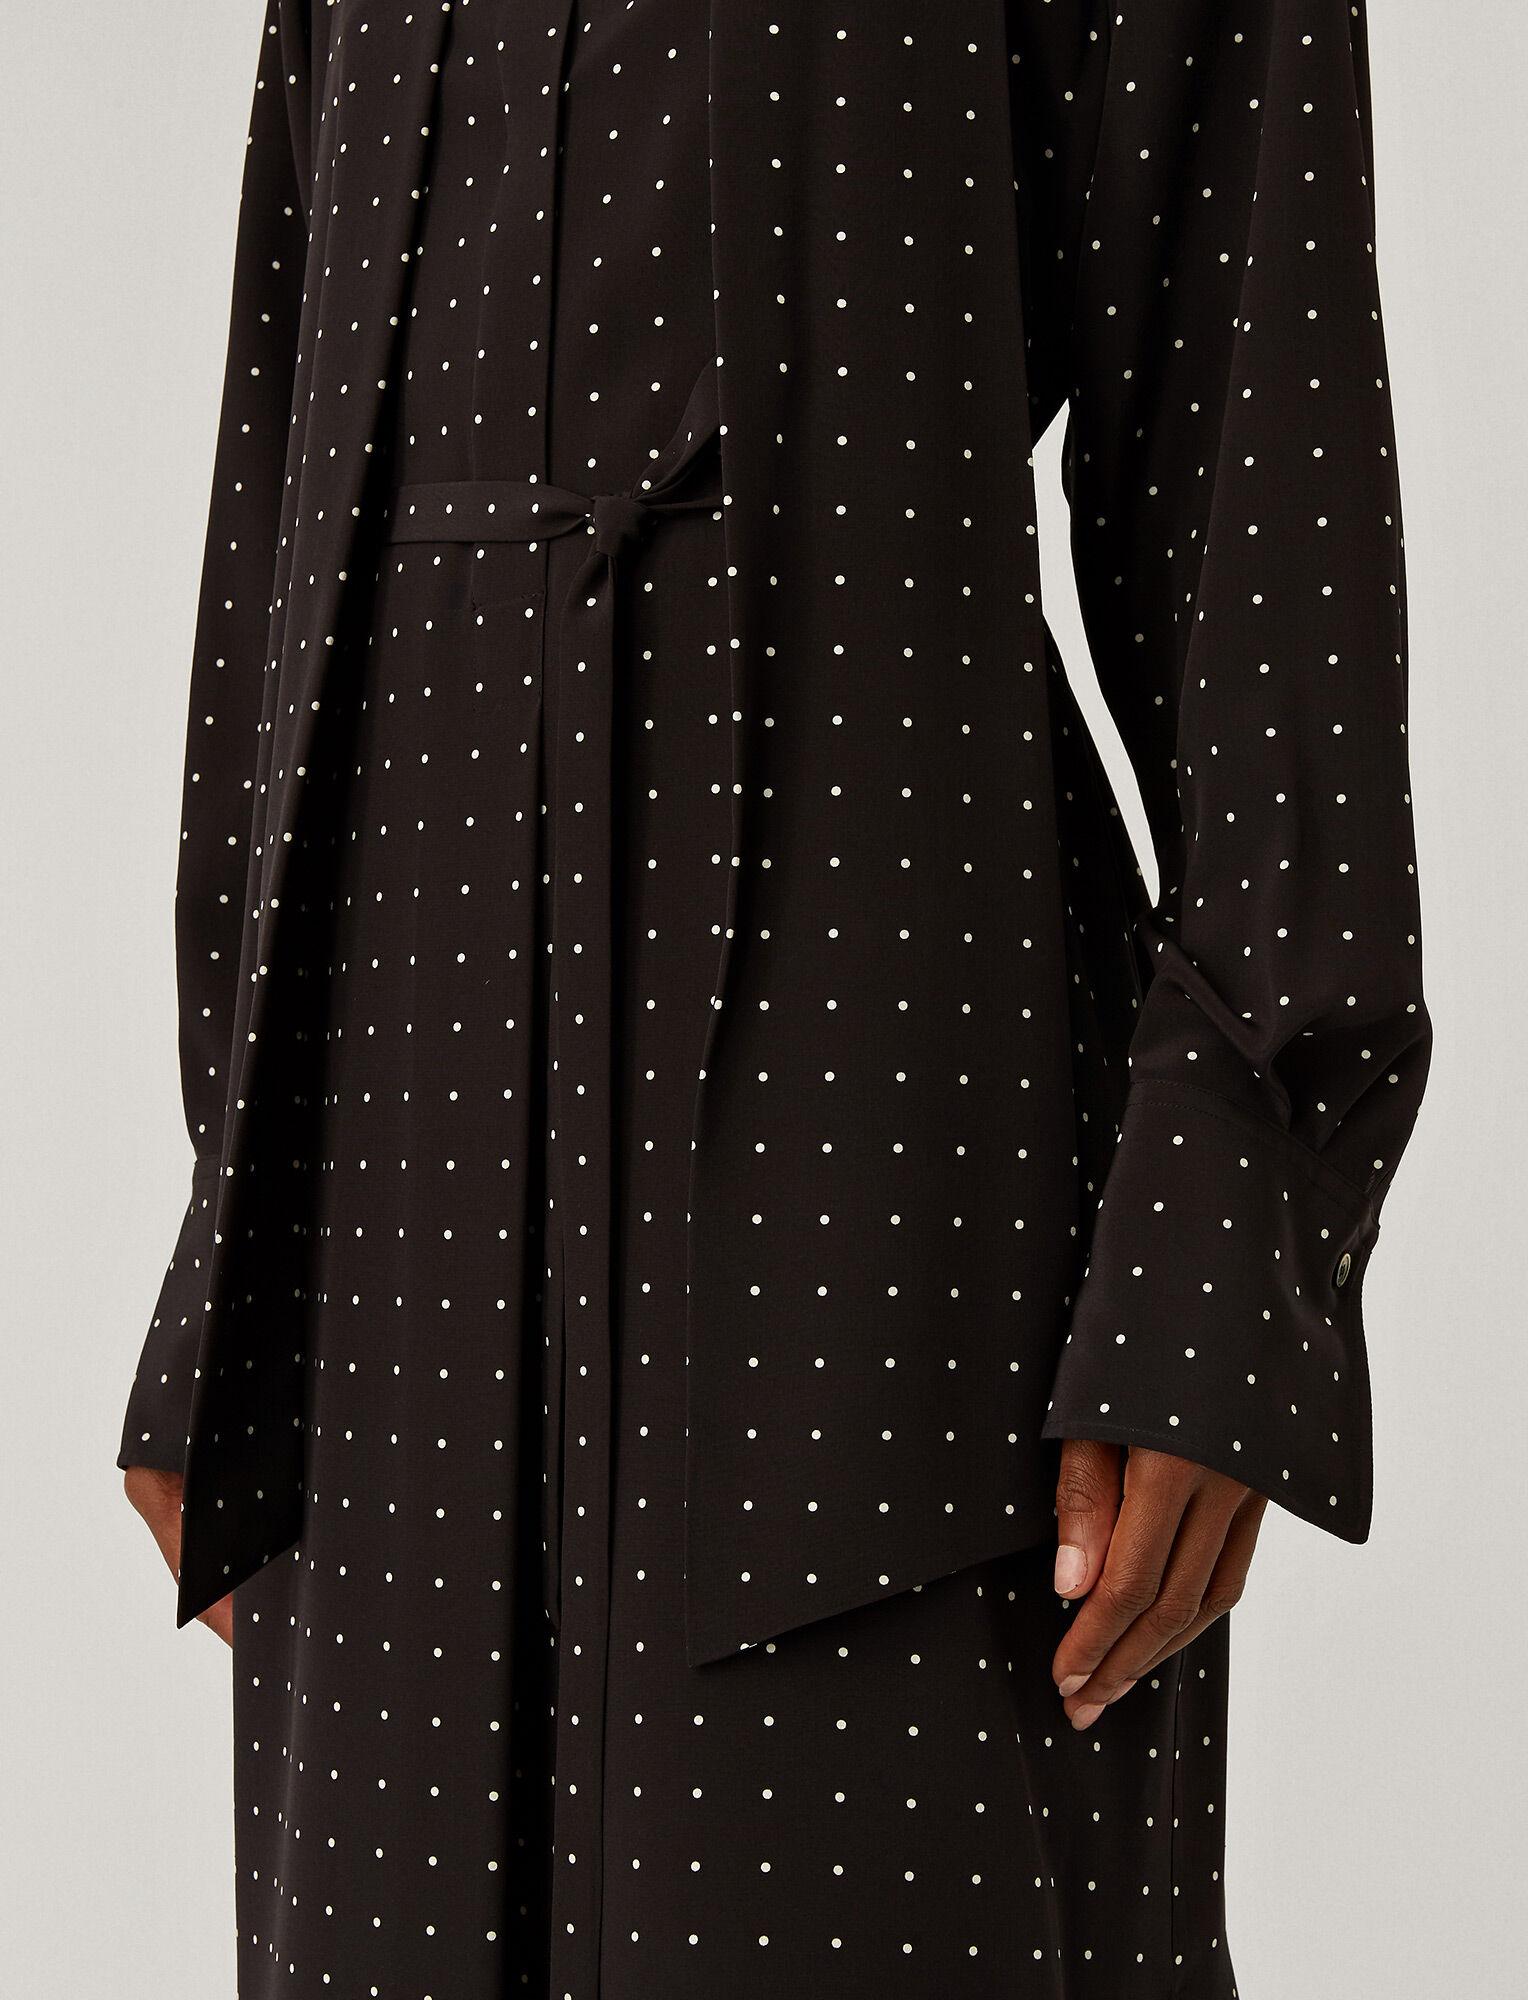 Joseph, Silk Polkadot Doriane Dress, in BLACK/IVORY